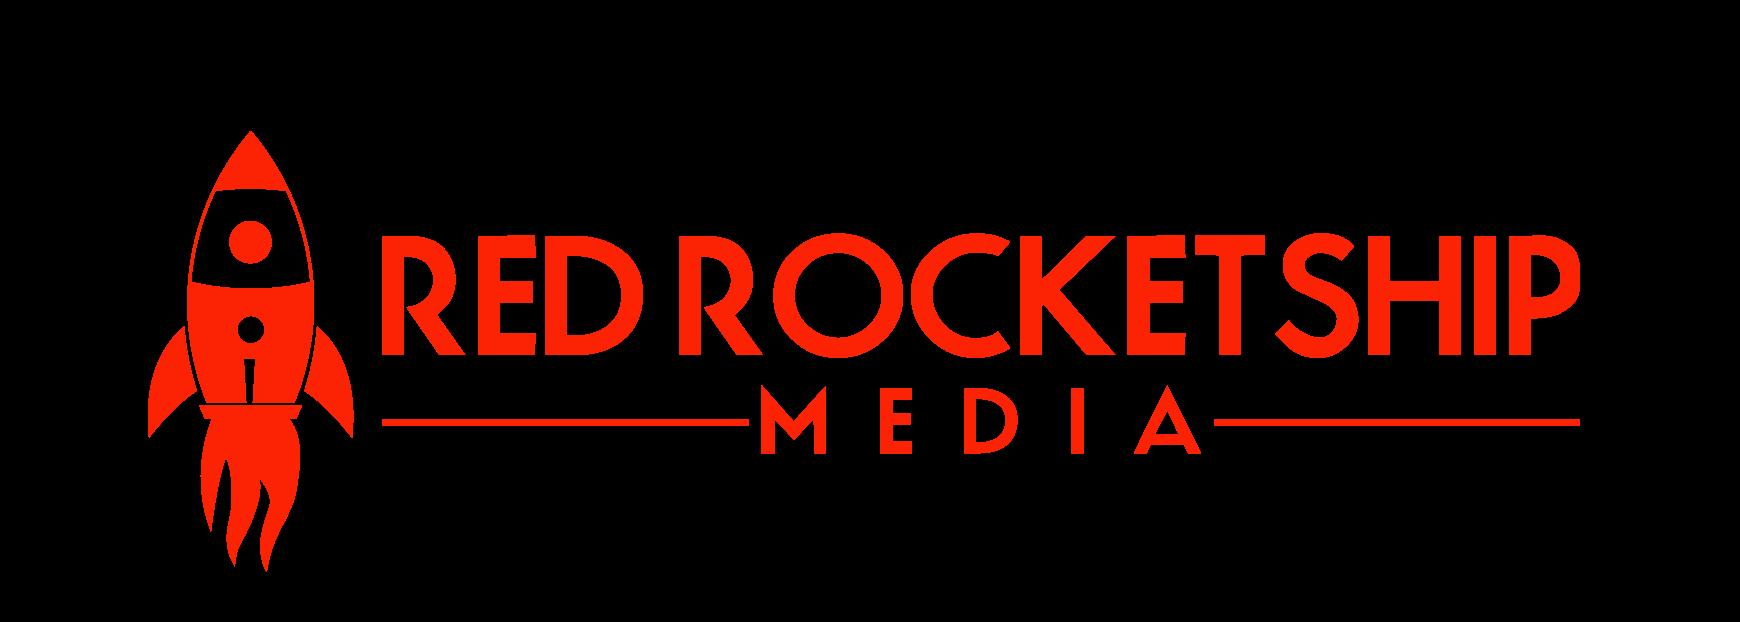 Redrocketshipmedia logo